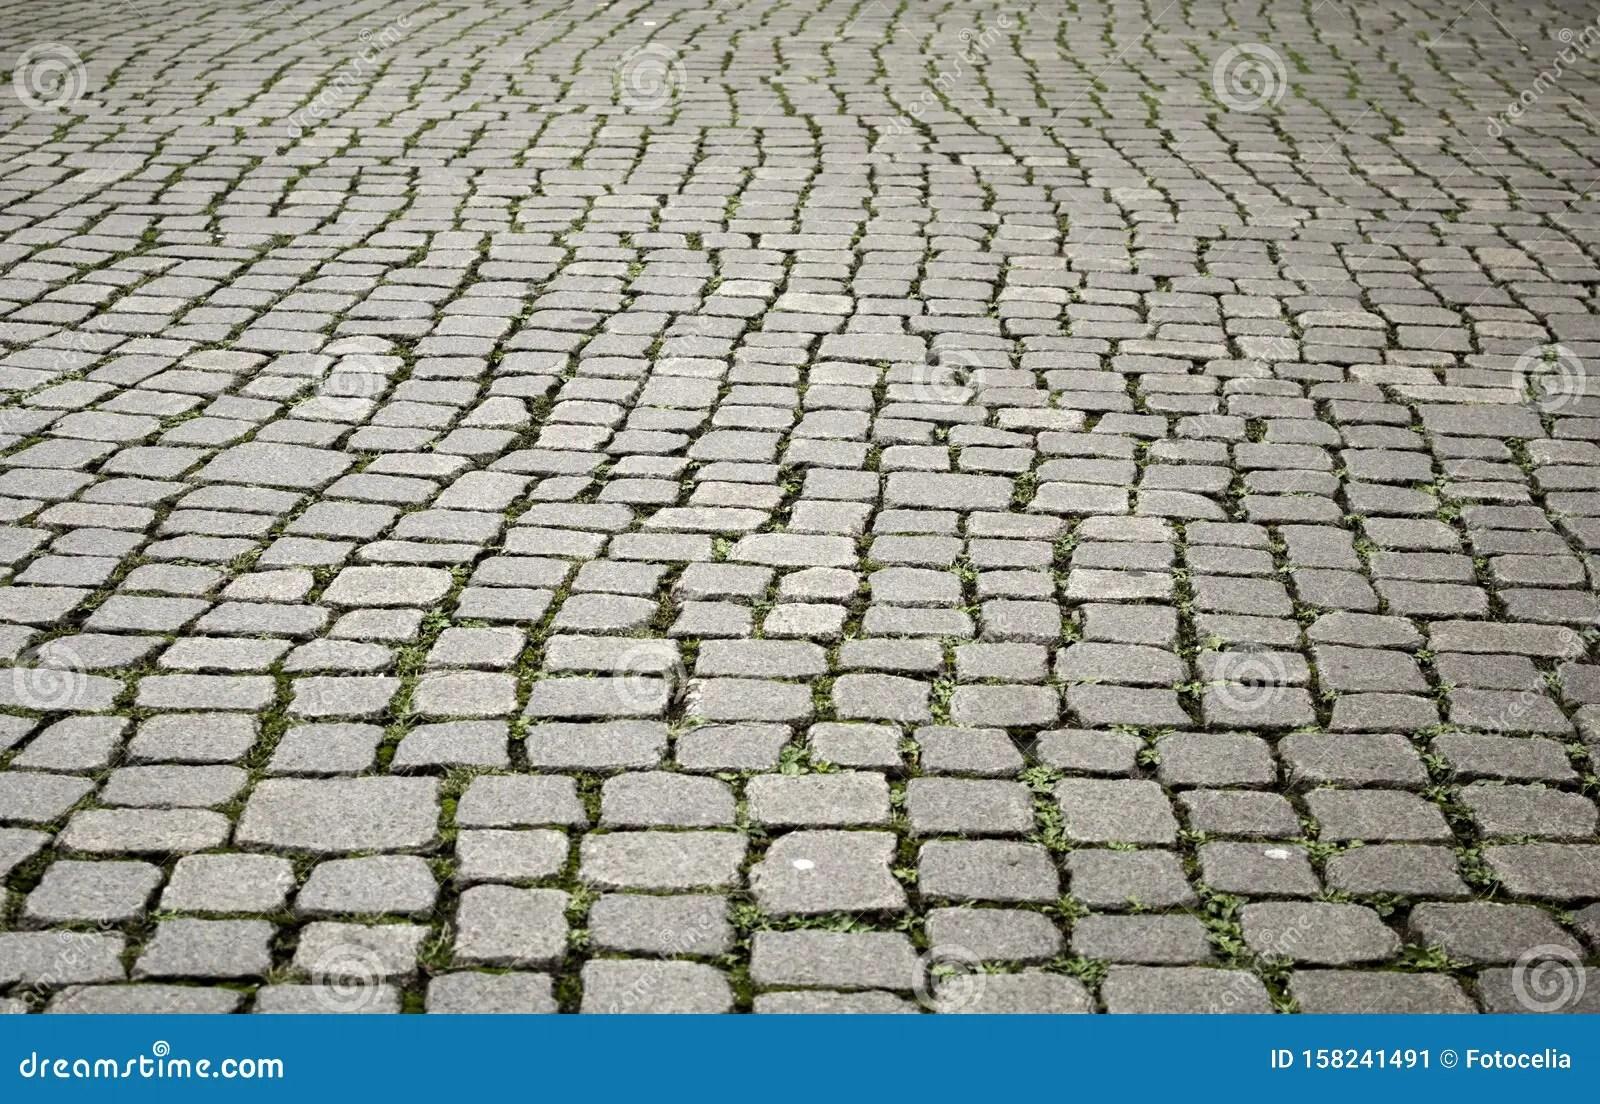 https www dreamstime com floor tile street flooring stone tiles city construction texture paving sidewalk background pattern pavement cement block brick image158241491